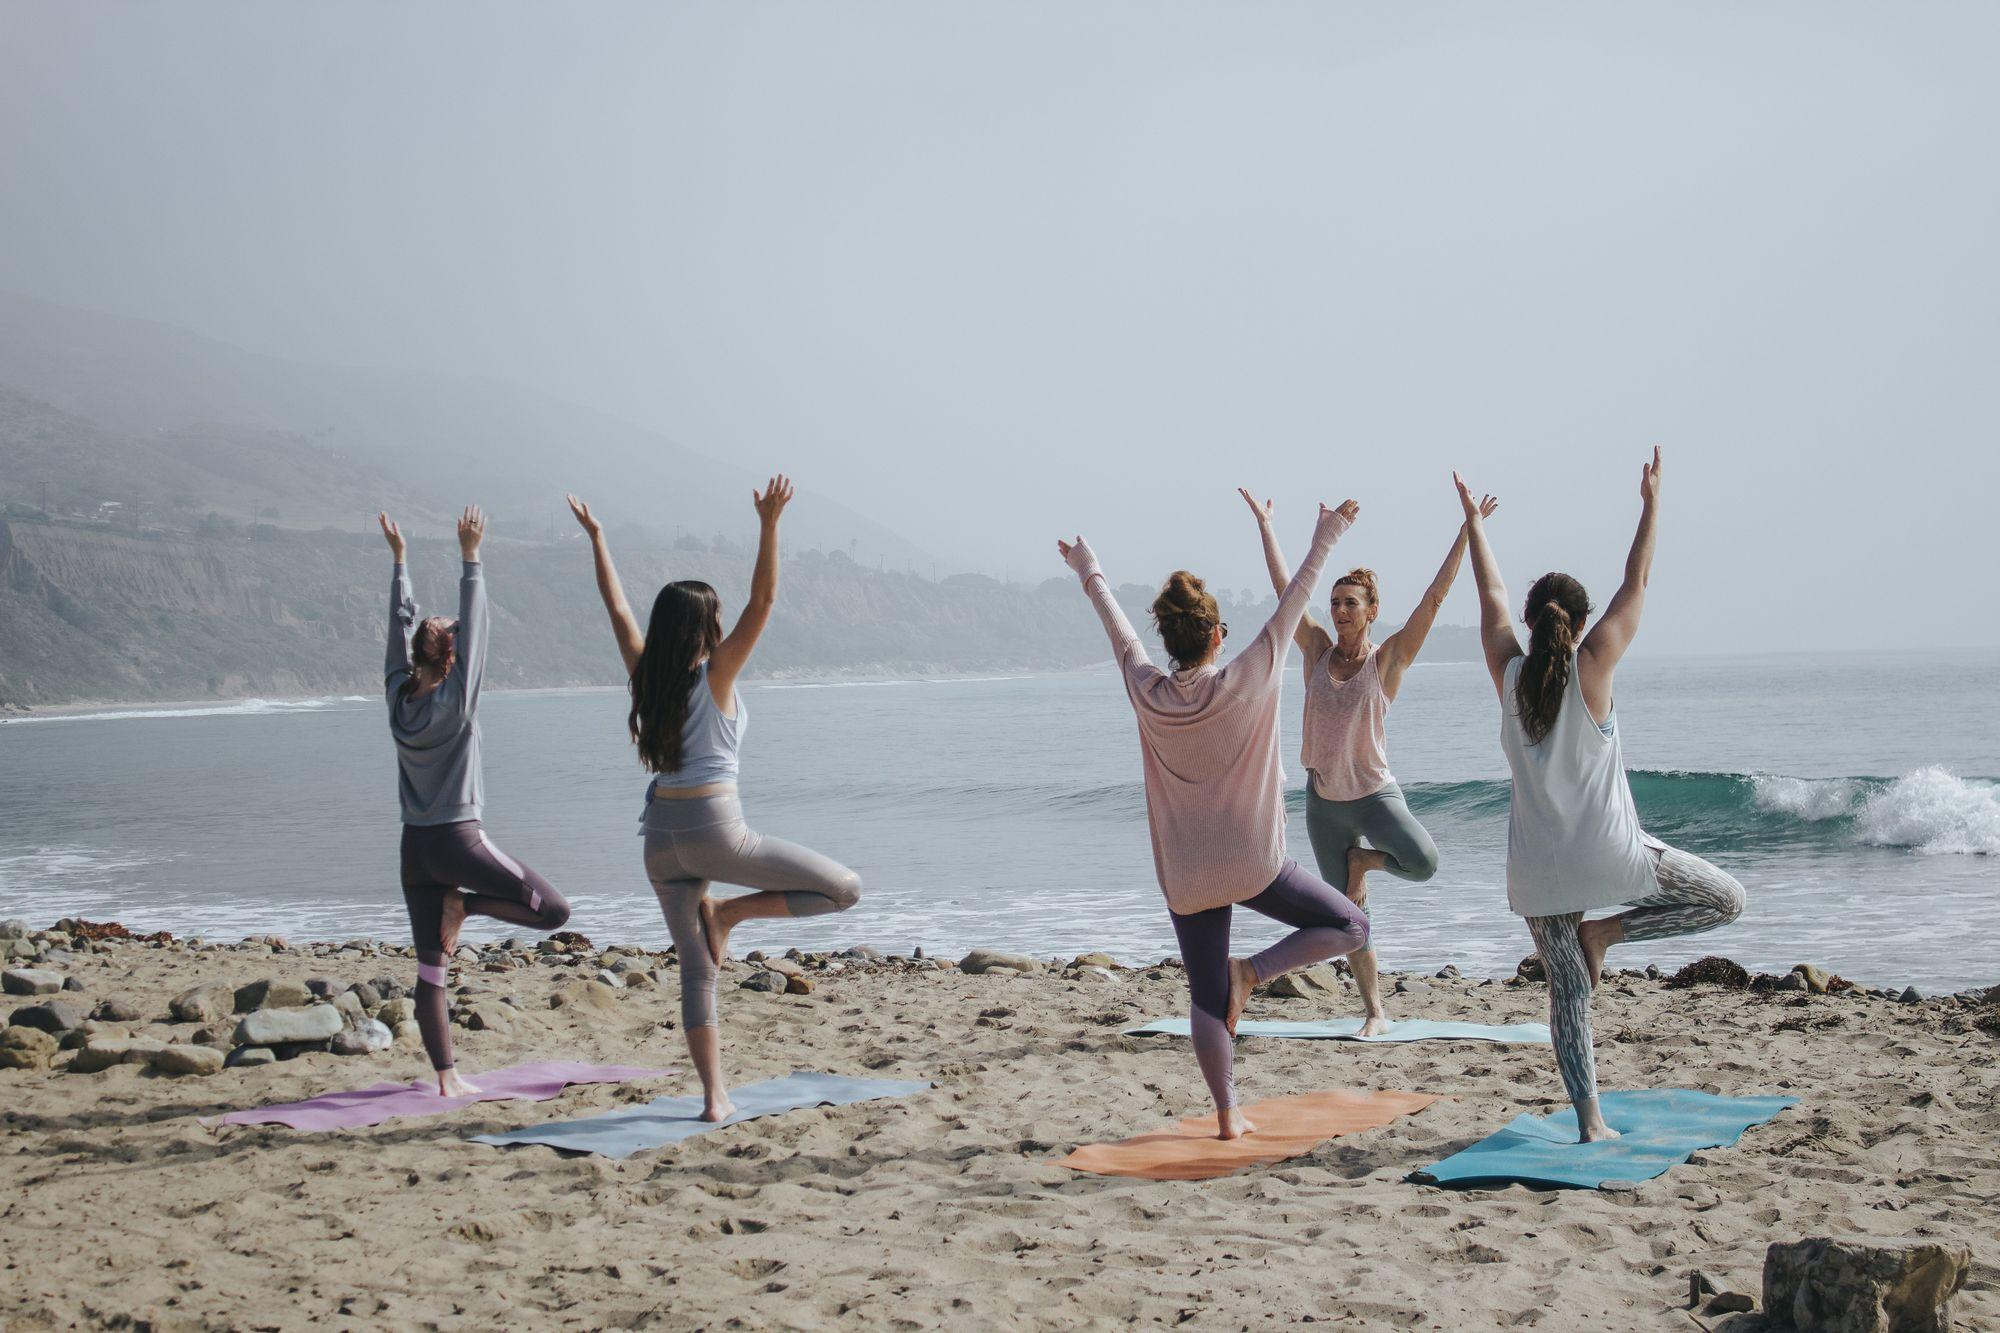 yoga solo entrepreneurs on beach